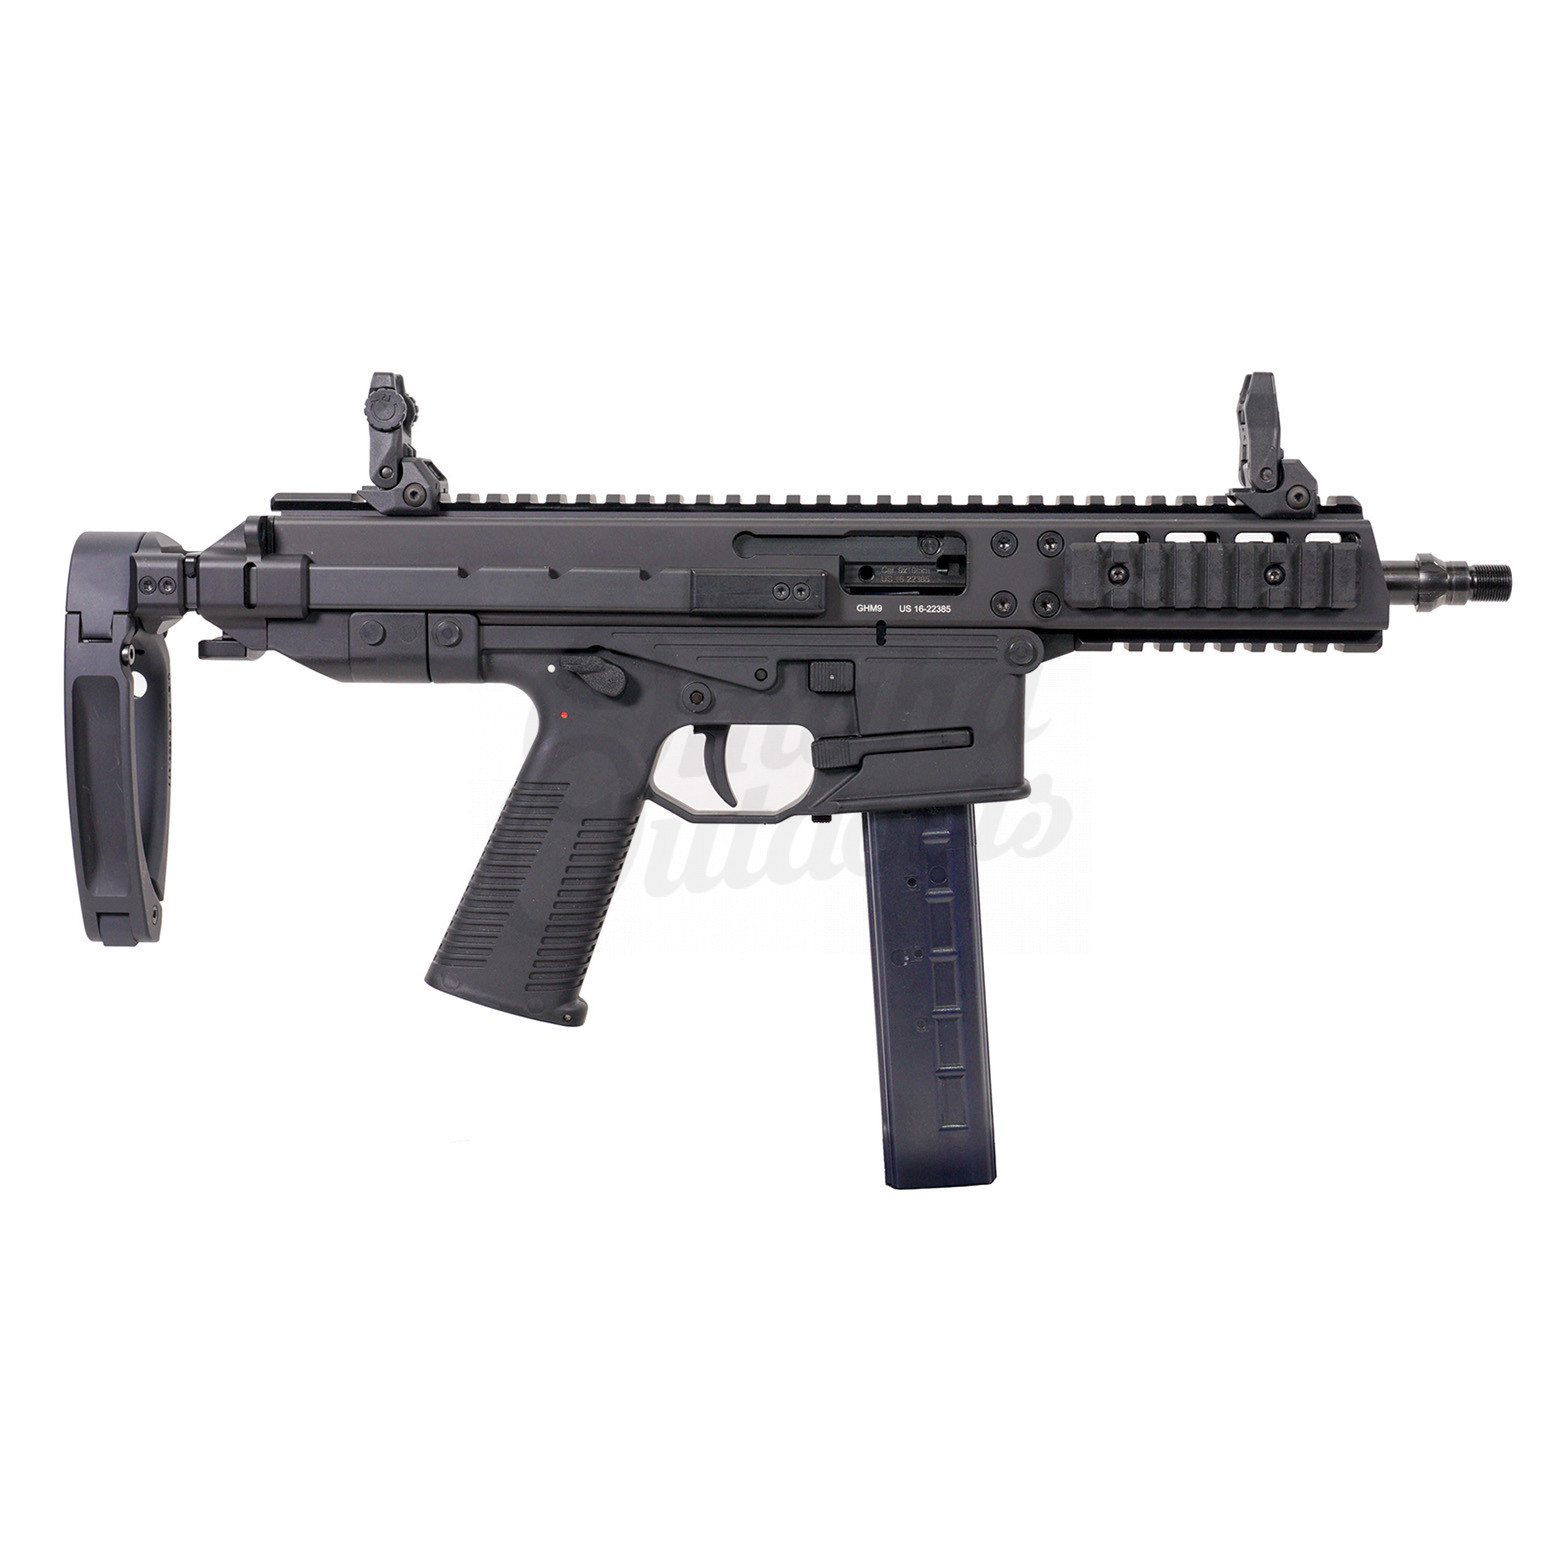 B&T GHM9 Pistol 30 RD 6